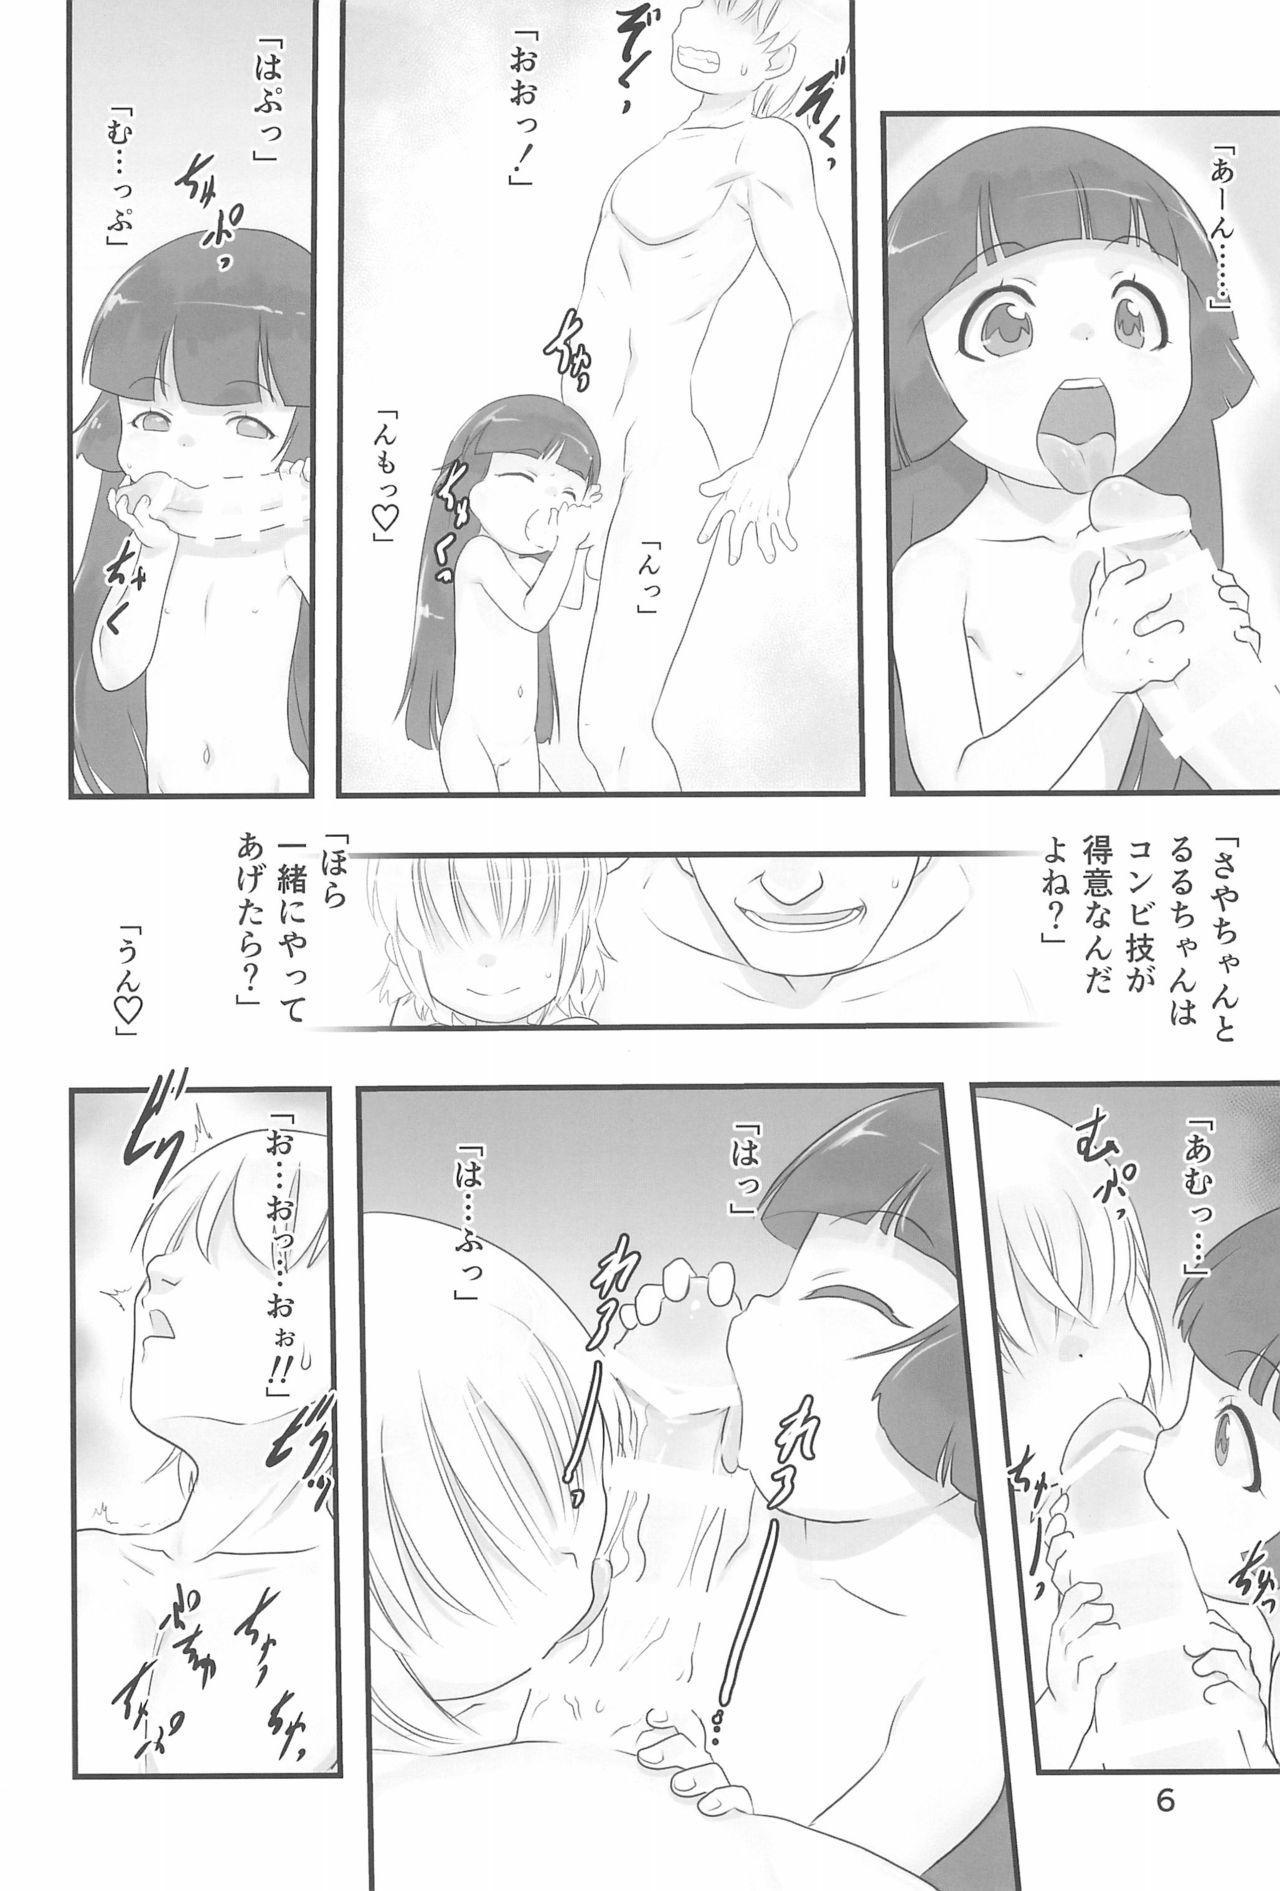 Hasamikko. Ichiban Sentou 5